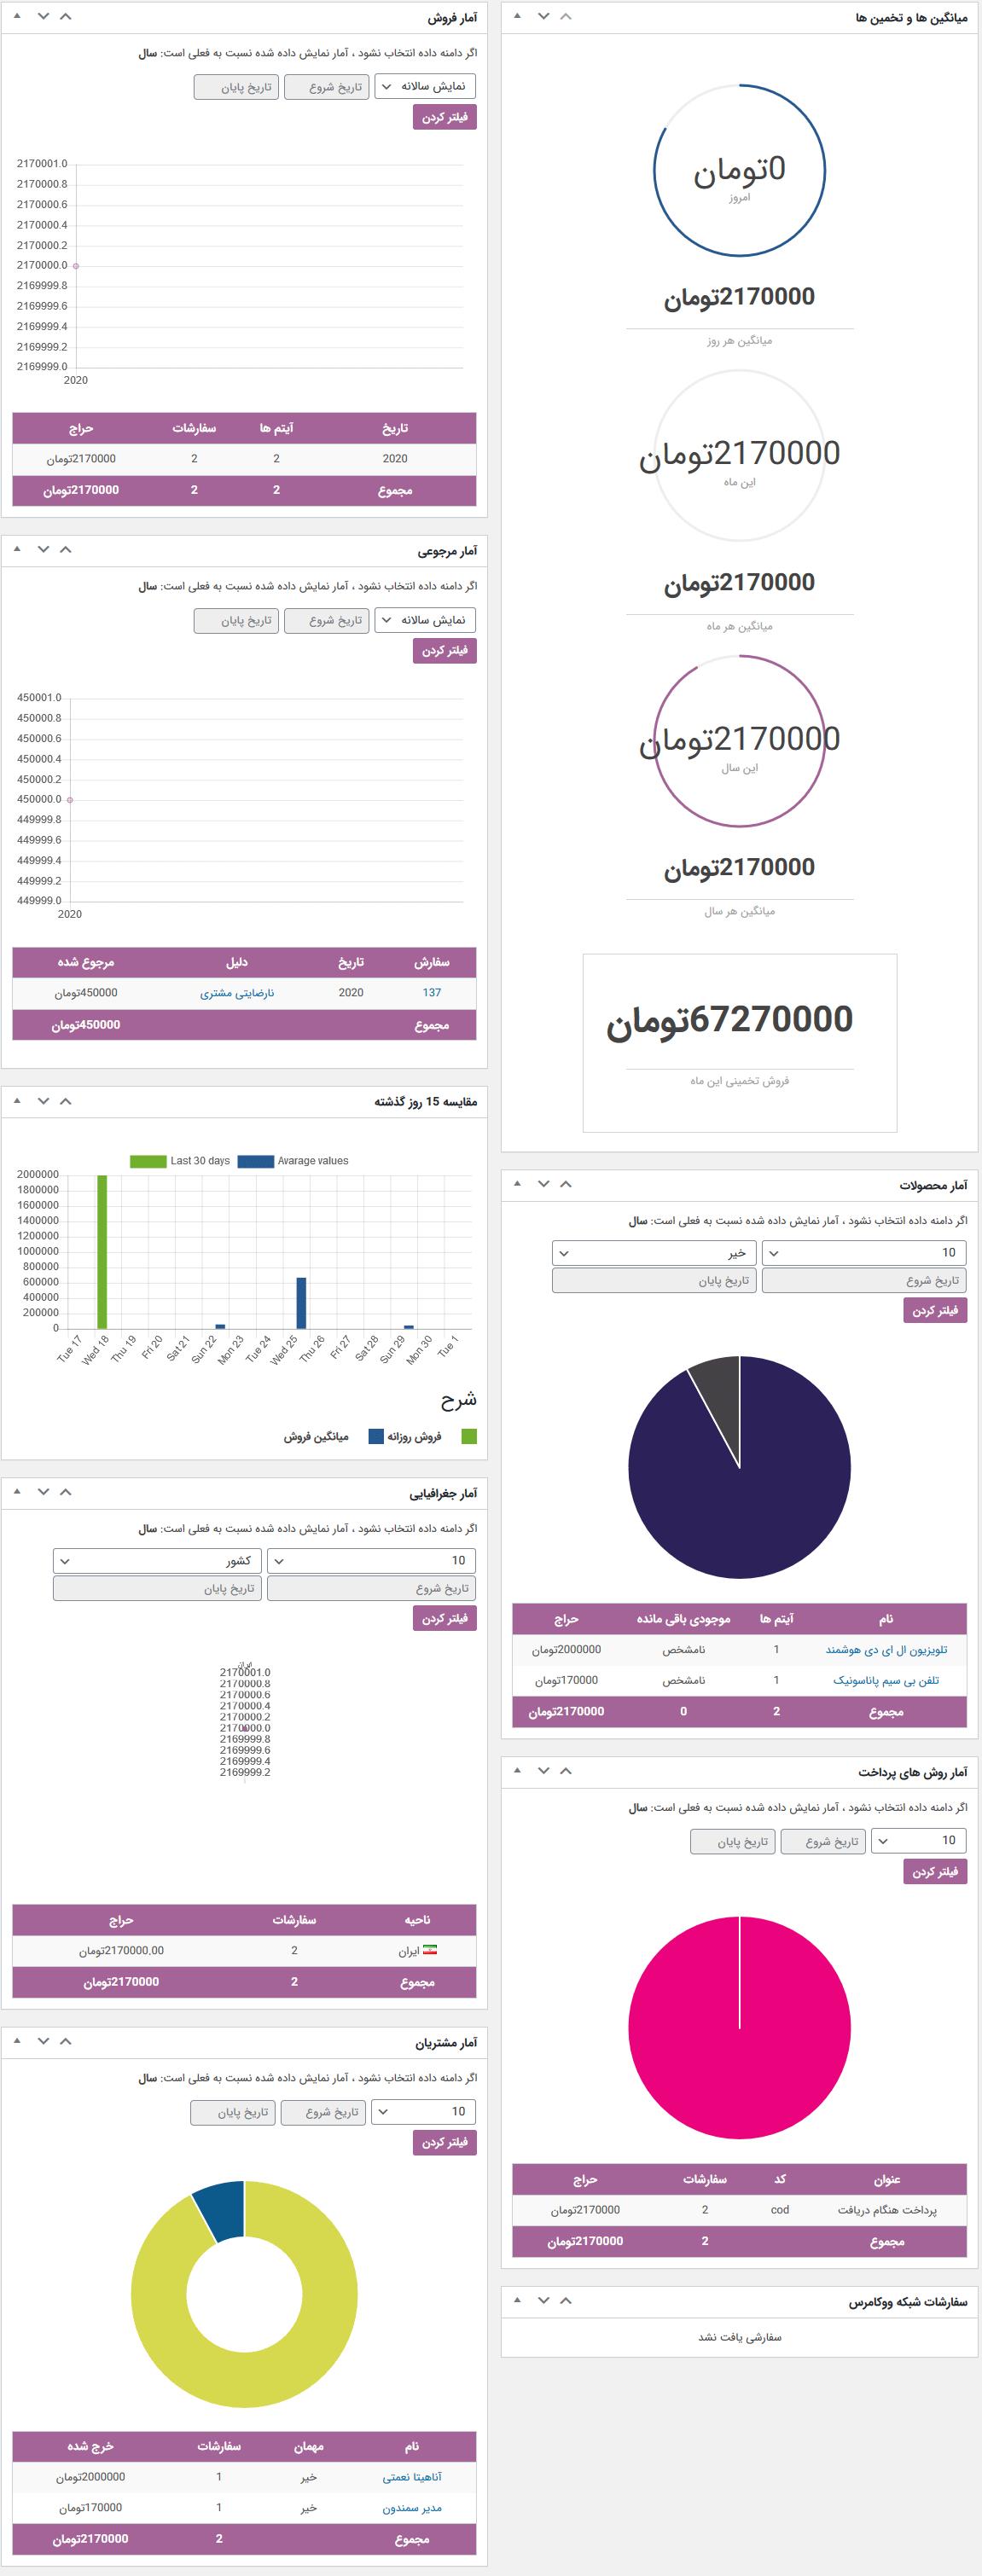 ابزارک آمار داشبورد ووکامرس توسط افزونه WooCommerce Dashboard Widgets Stats